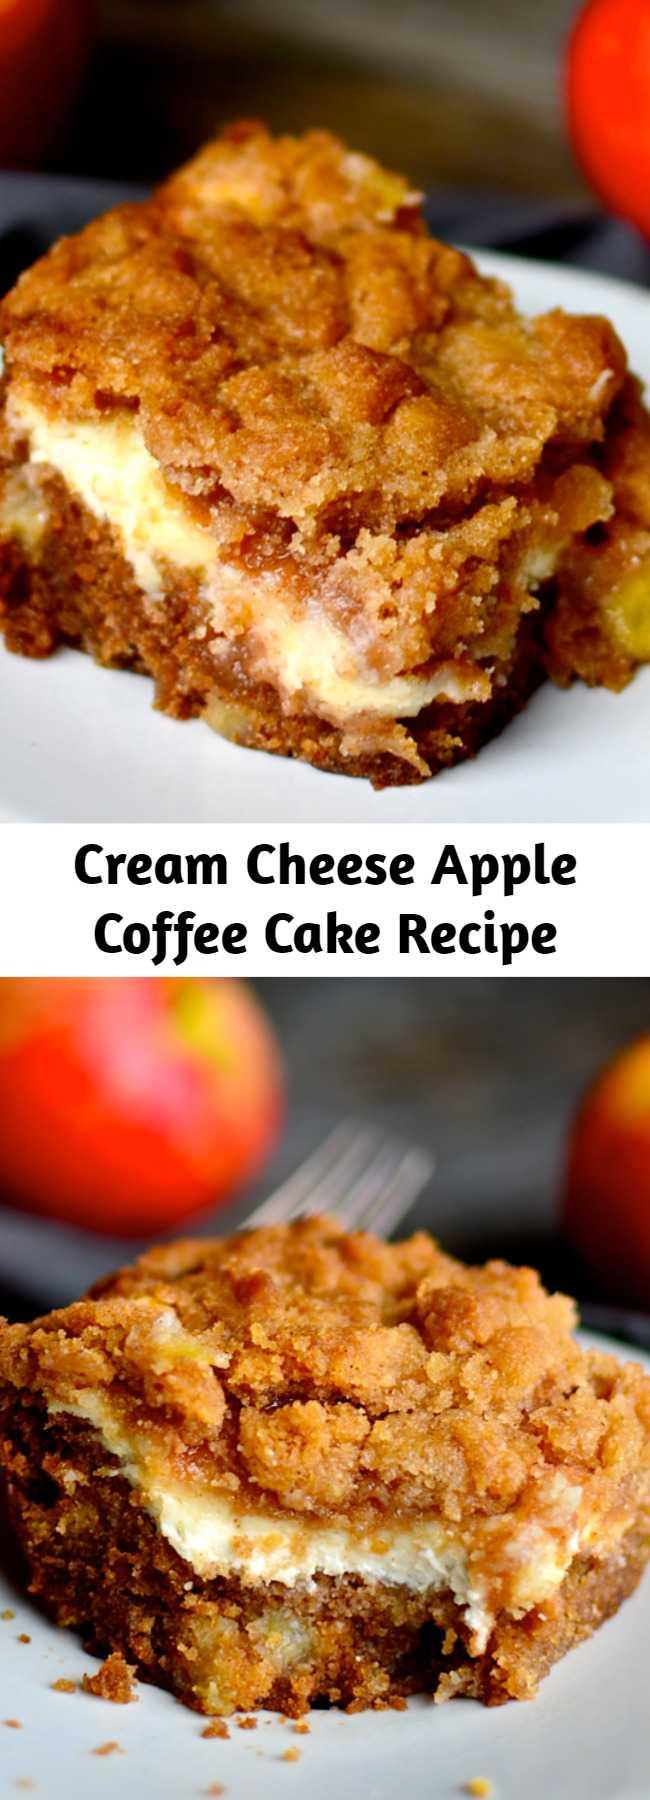 Cream Cheese Apple Coffee Cake Recipe - What a beautiful dessert. I love using the apples of the season.